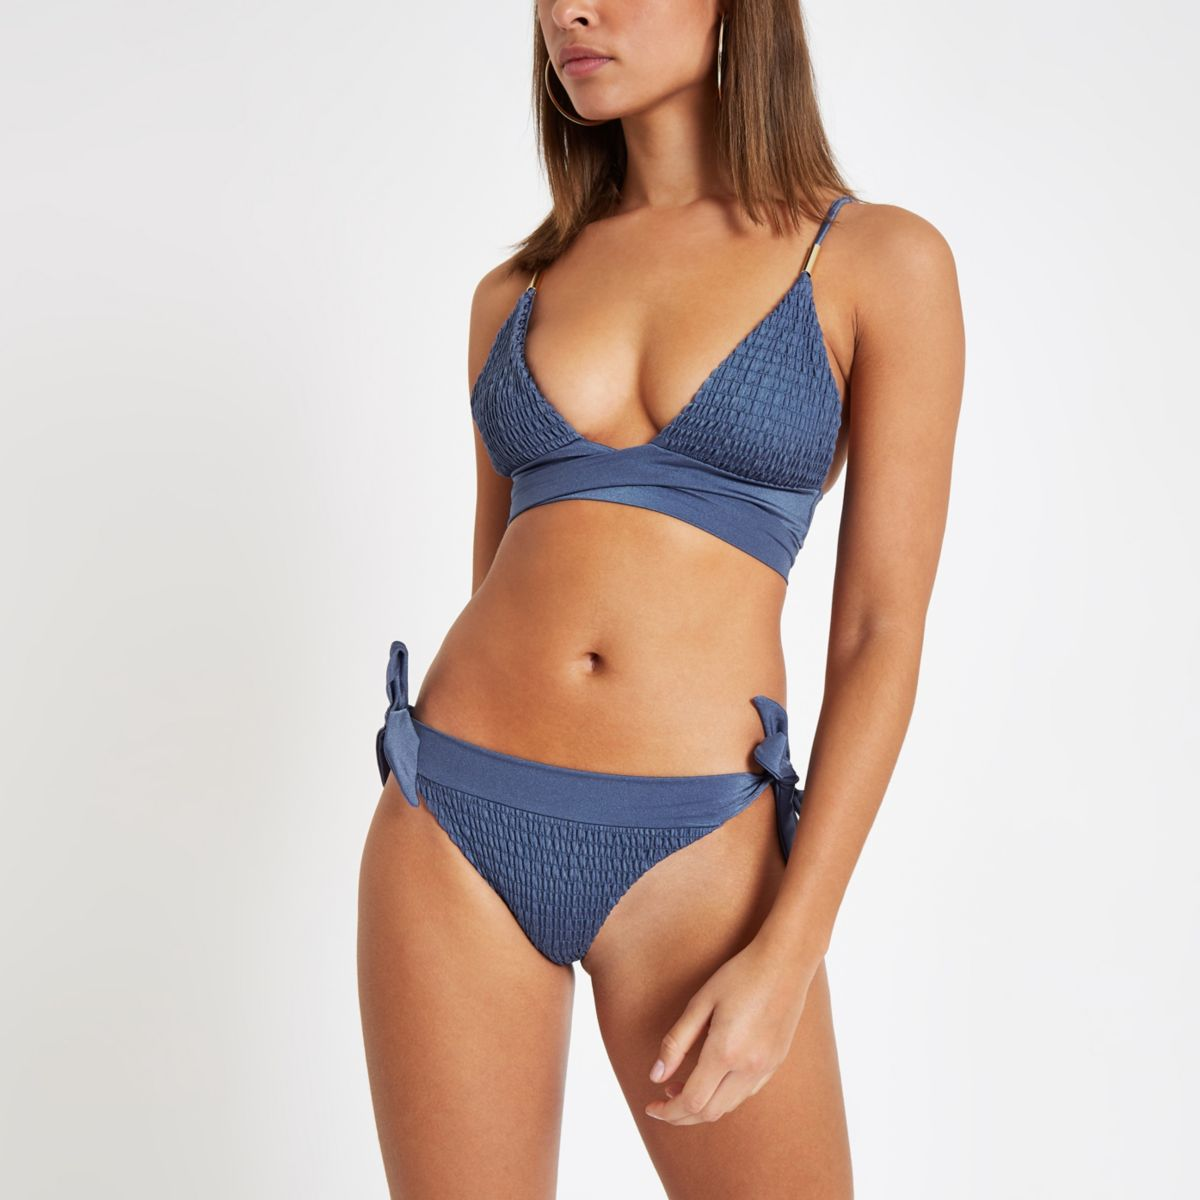 Blauwe gesmokte triangel-bikinitop met strik voor